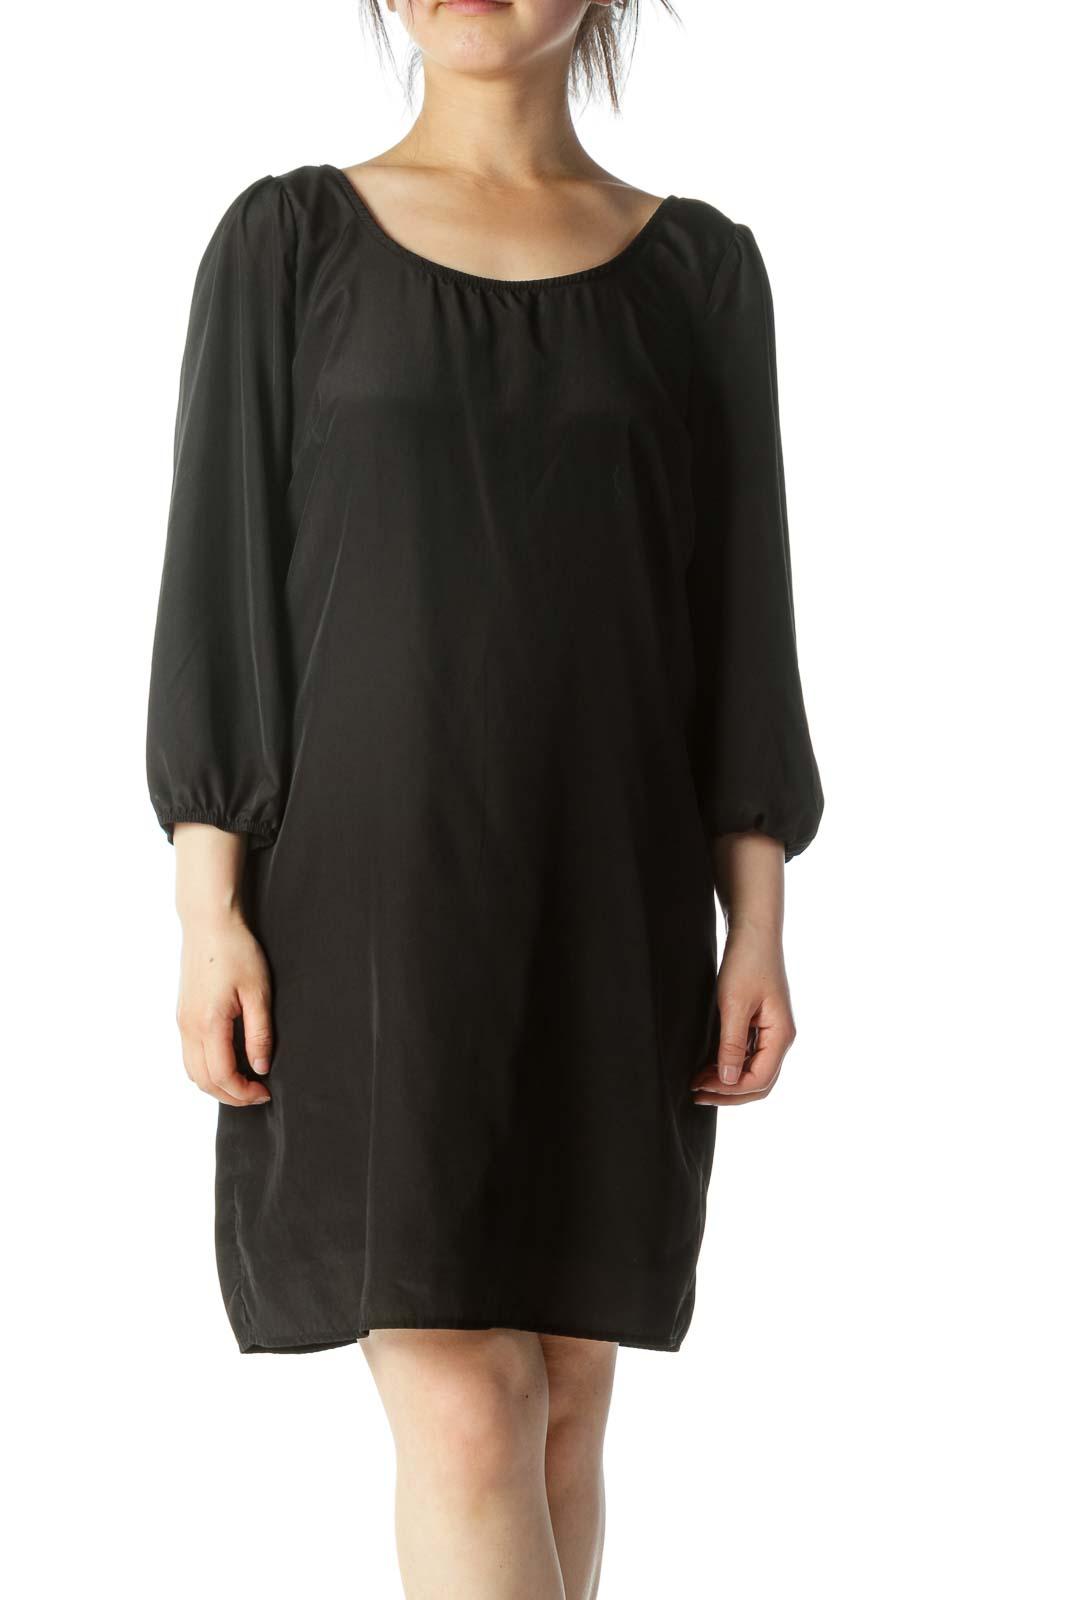 Black Shiny Back Zippered Midi Dress Front